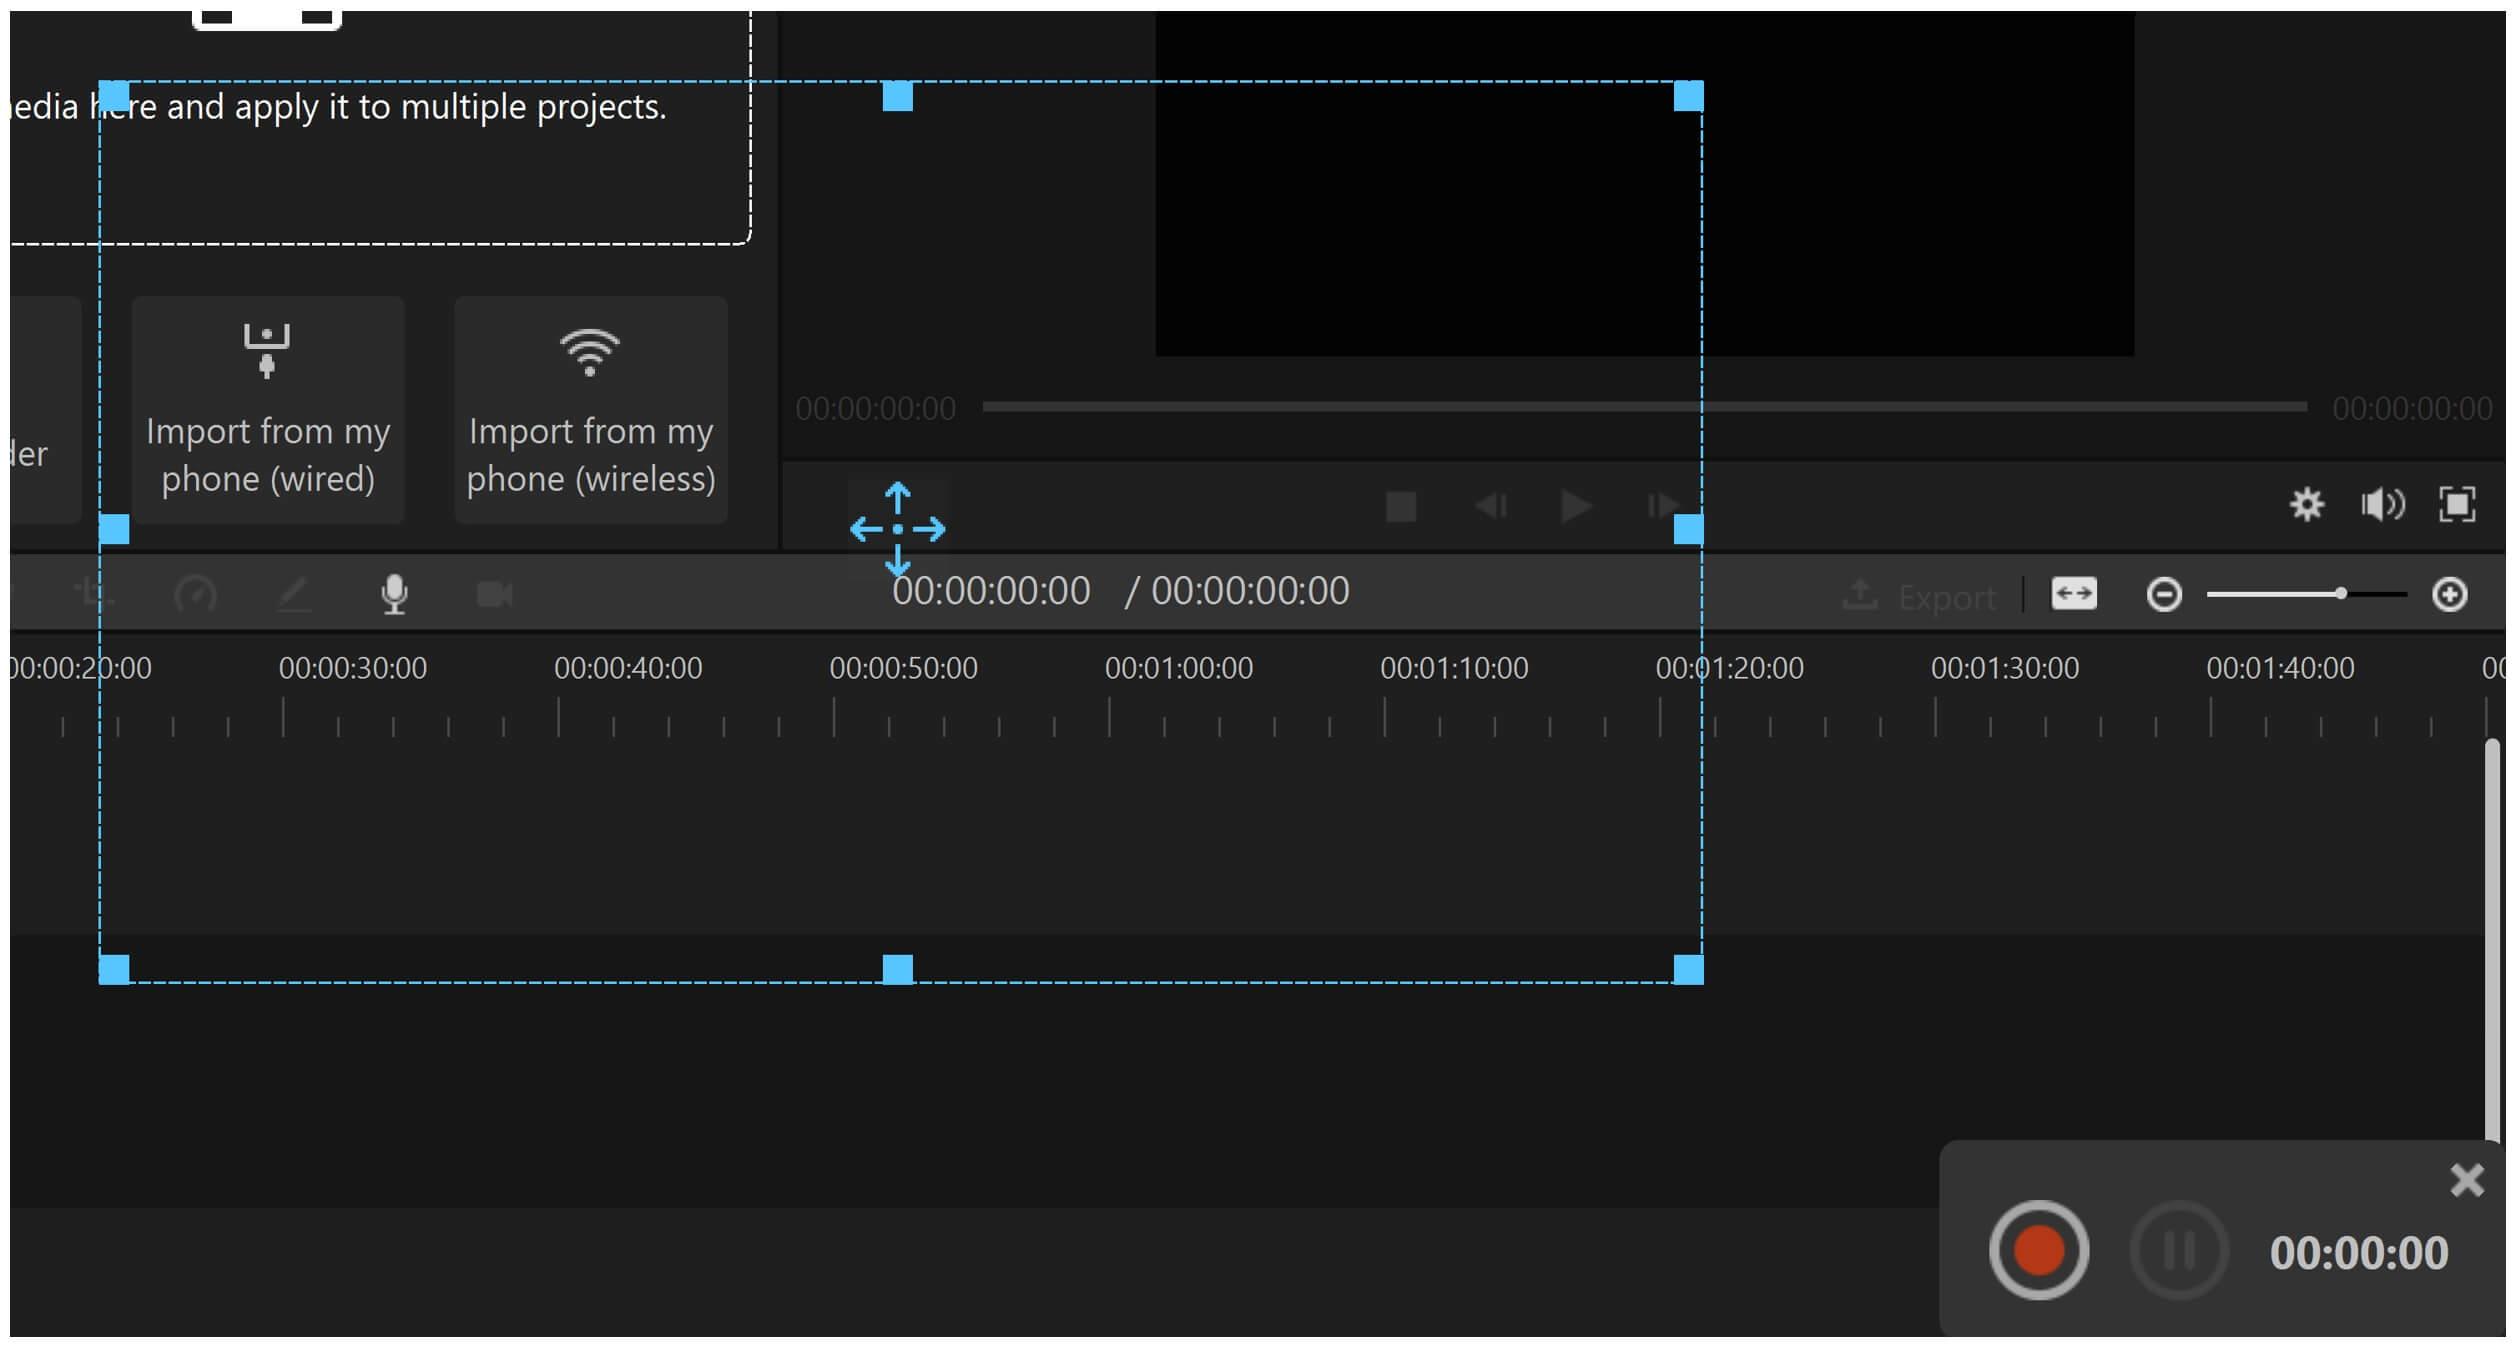 record webcam and screen filme hit screen record button